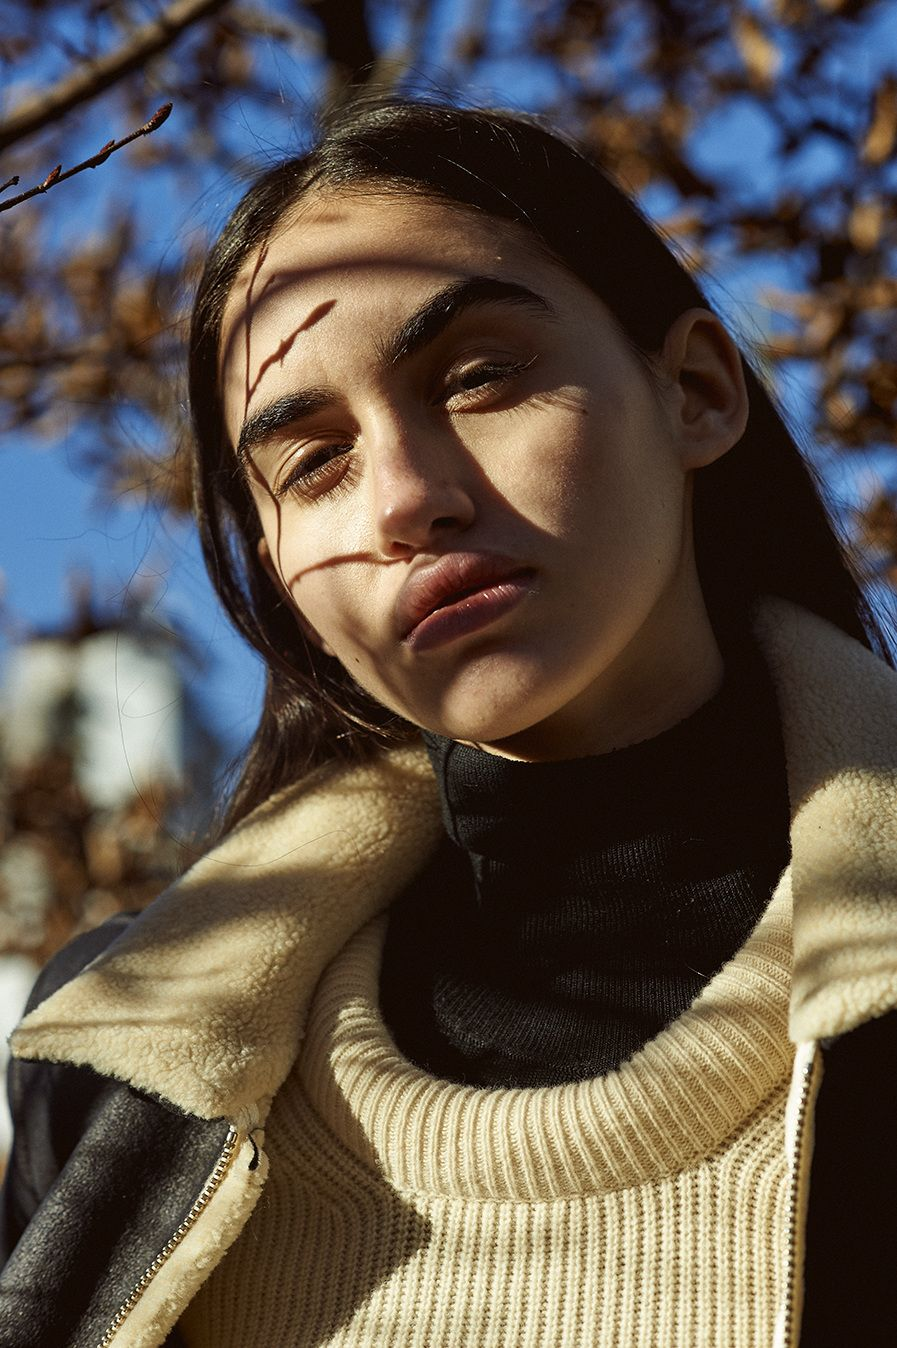 Photo: Federico Sorrentino Styling: SIlvia Vinci Make up: Rocco Santamorena Hairstyle: Daniela Magginetti Model: Ella Ruby / The Lab Model Milano http://www.highsnobiety.com/2015/12/03/best-streetwear-fall-winter-2015/